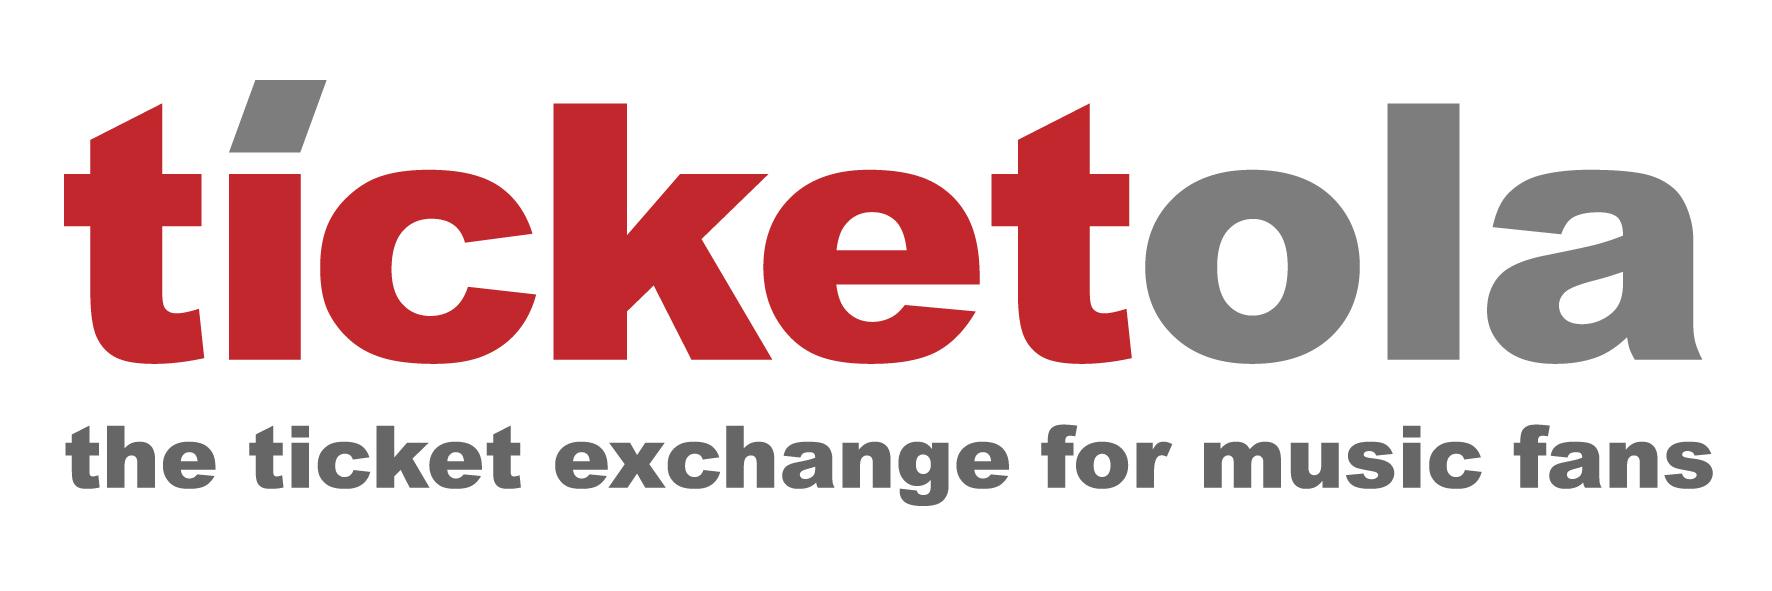 ticketola-logo